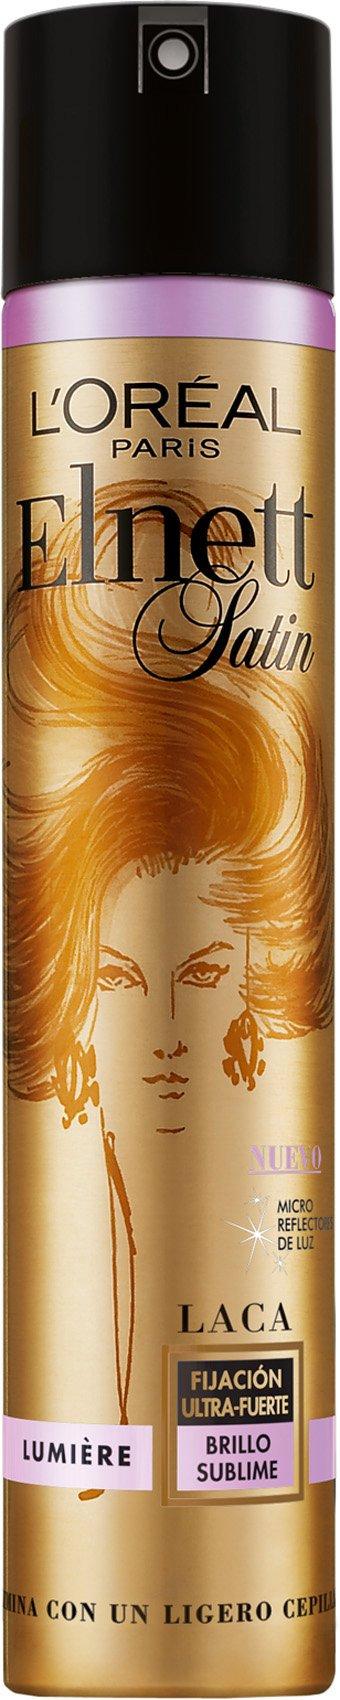 L'Oreal Paris Elnett Laca de Peinado Fijación fuerte Lumière